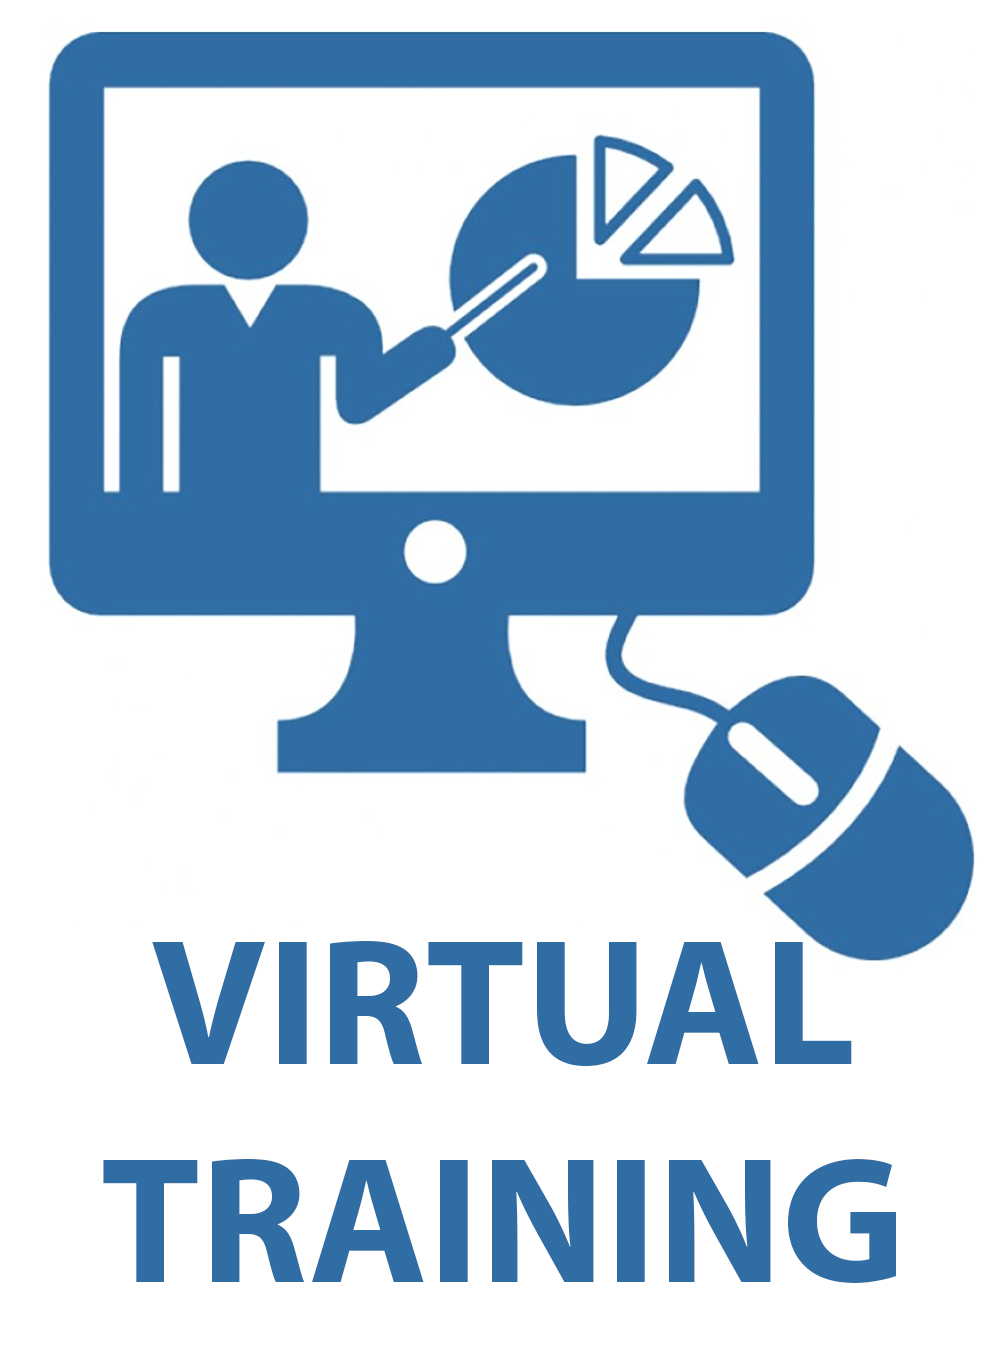 Virtual Training Loan Policy Development